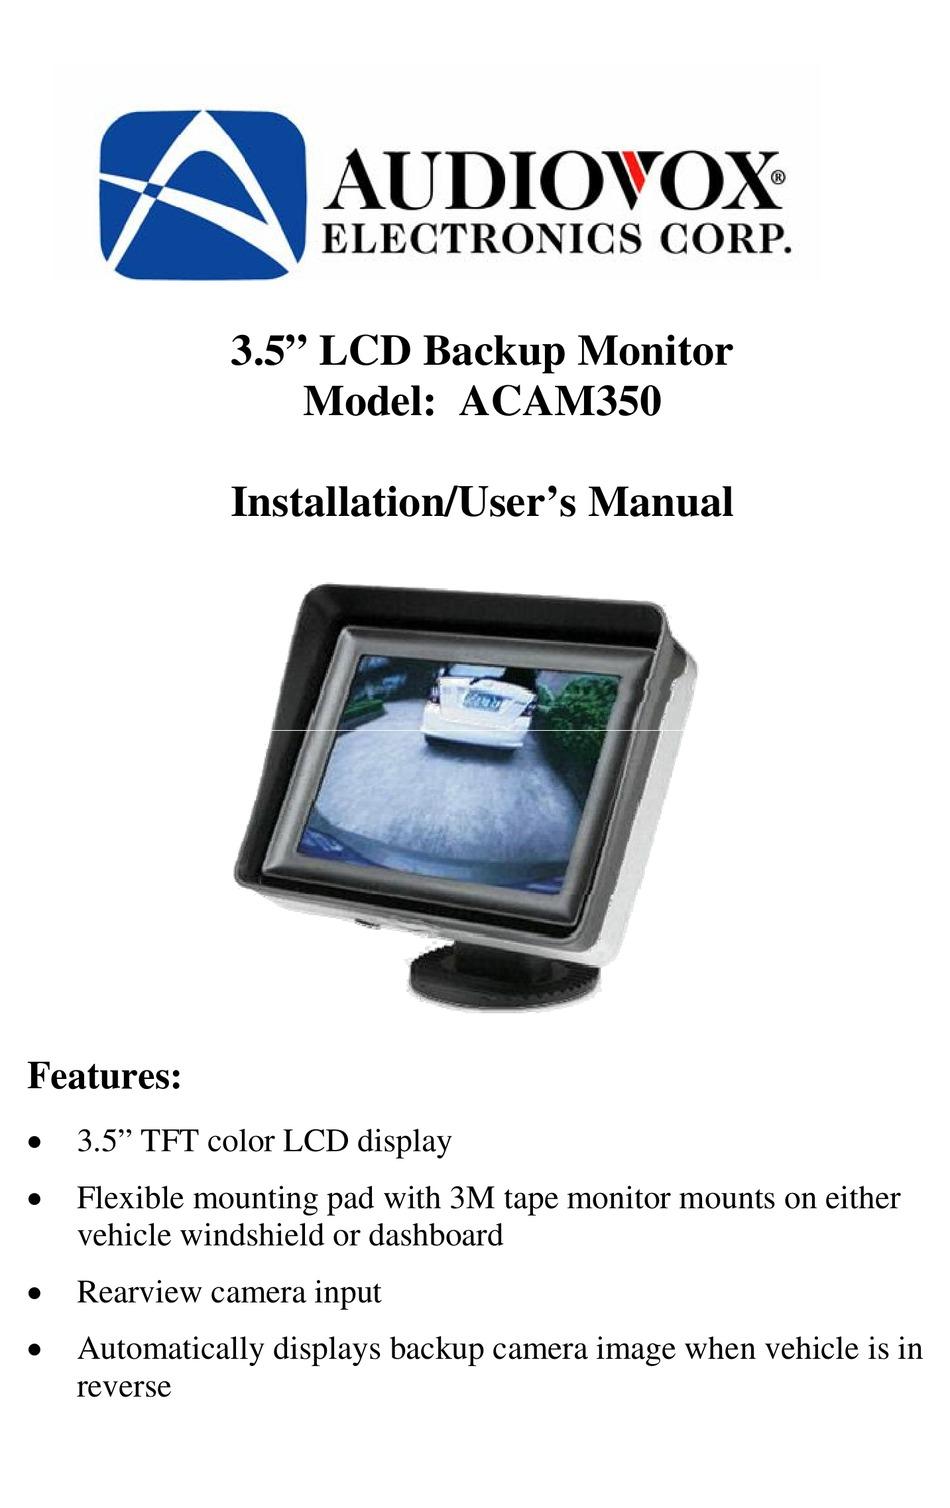 Audiovox Acam350 Installation User Manual Pdf Download Manualslib